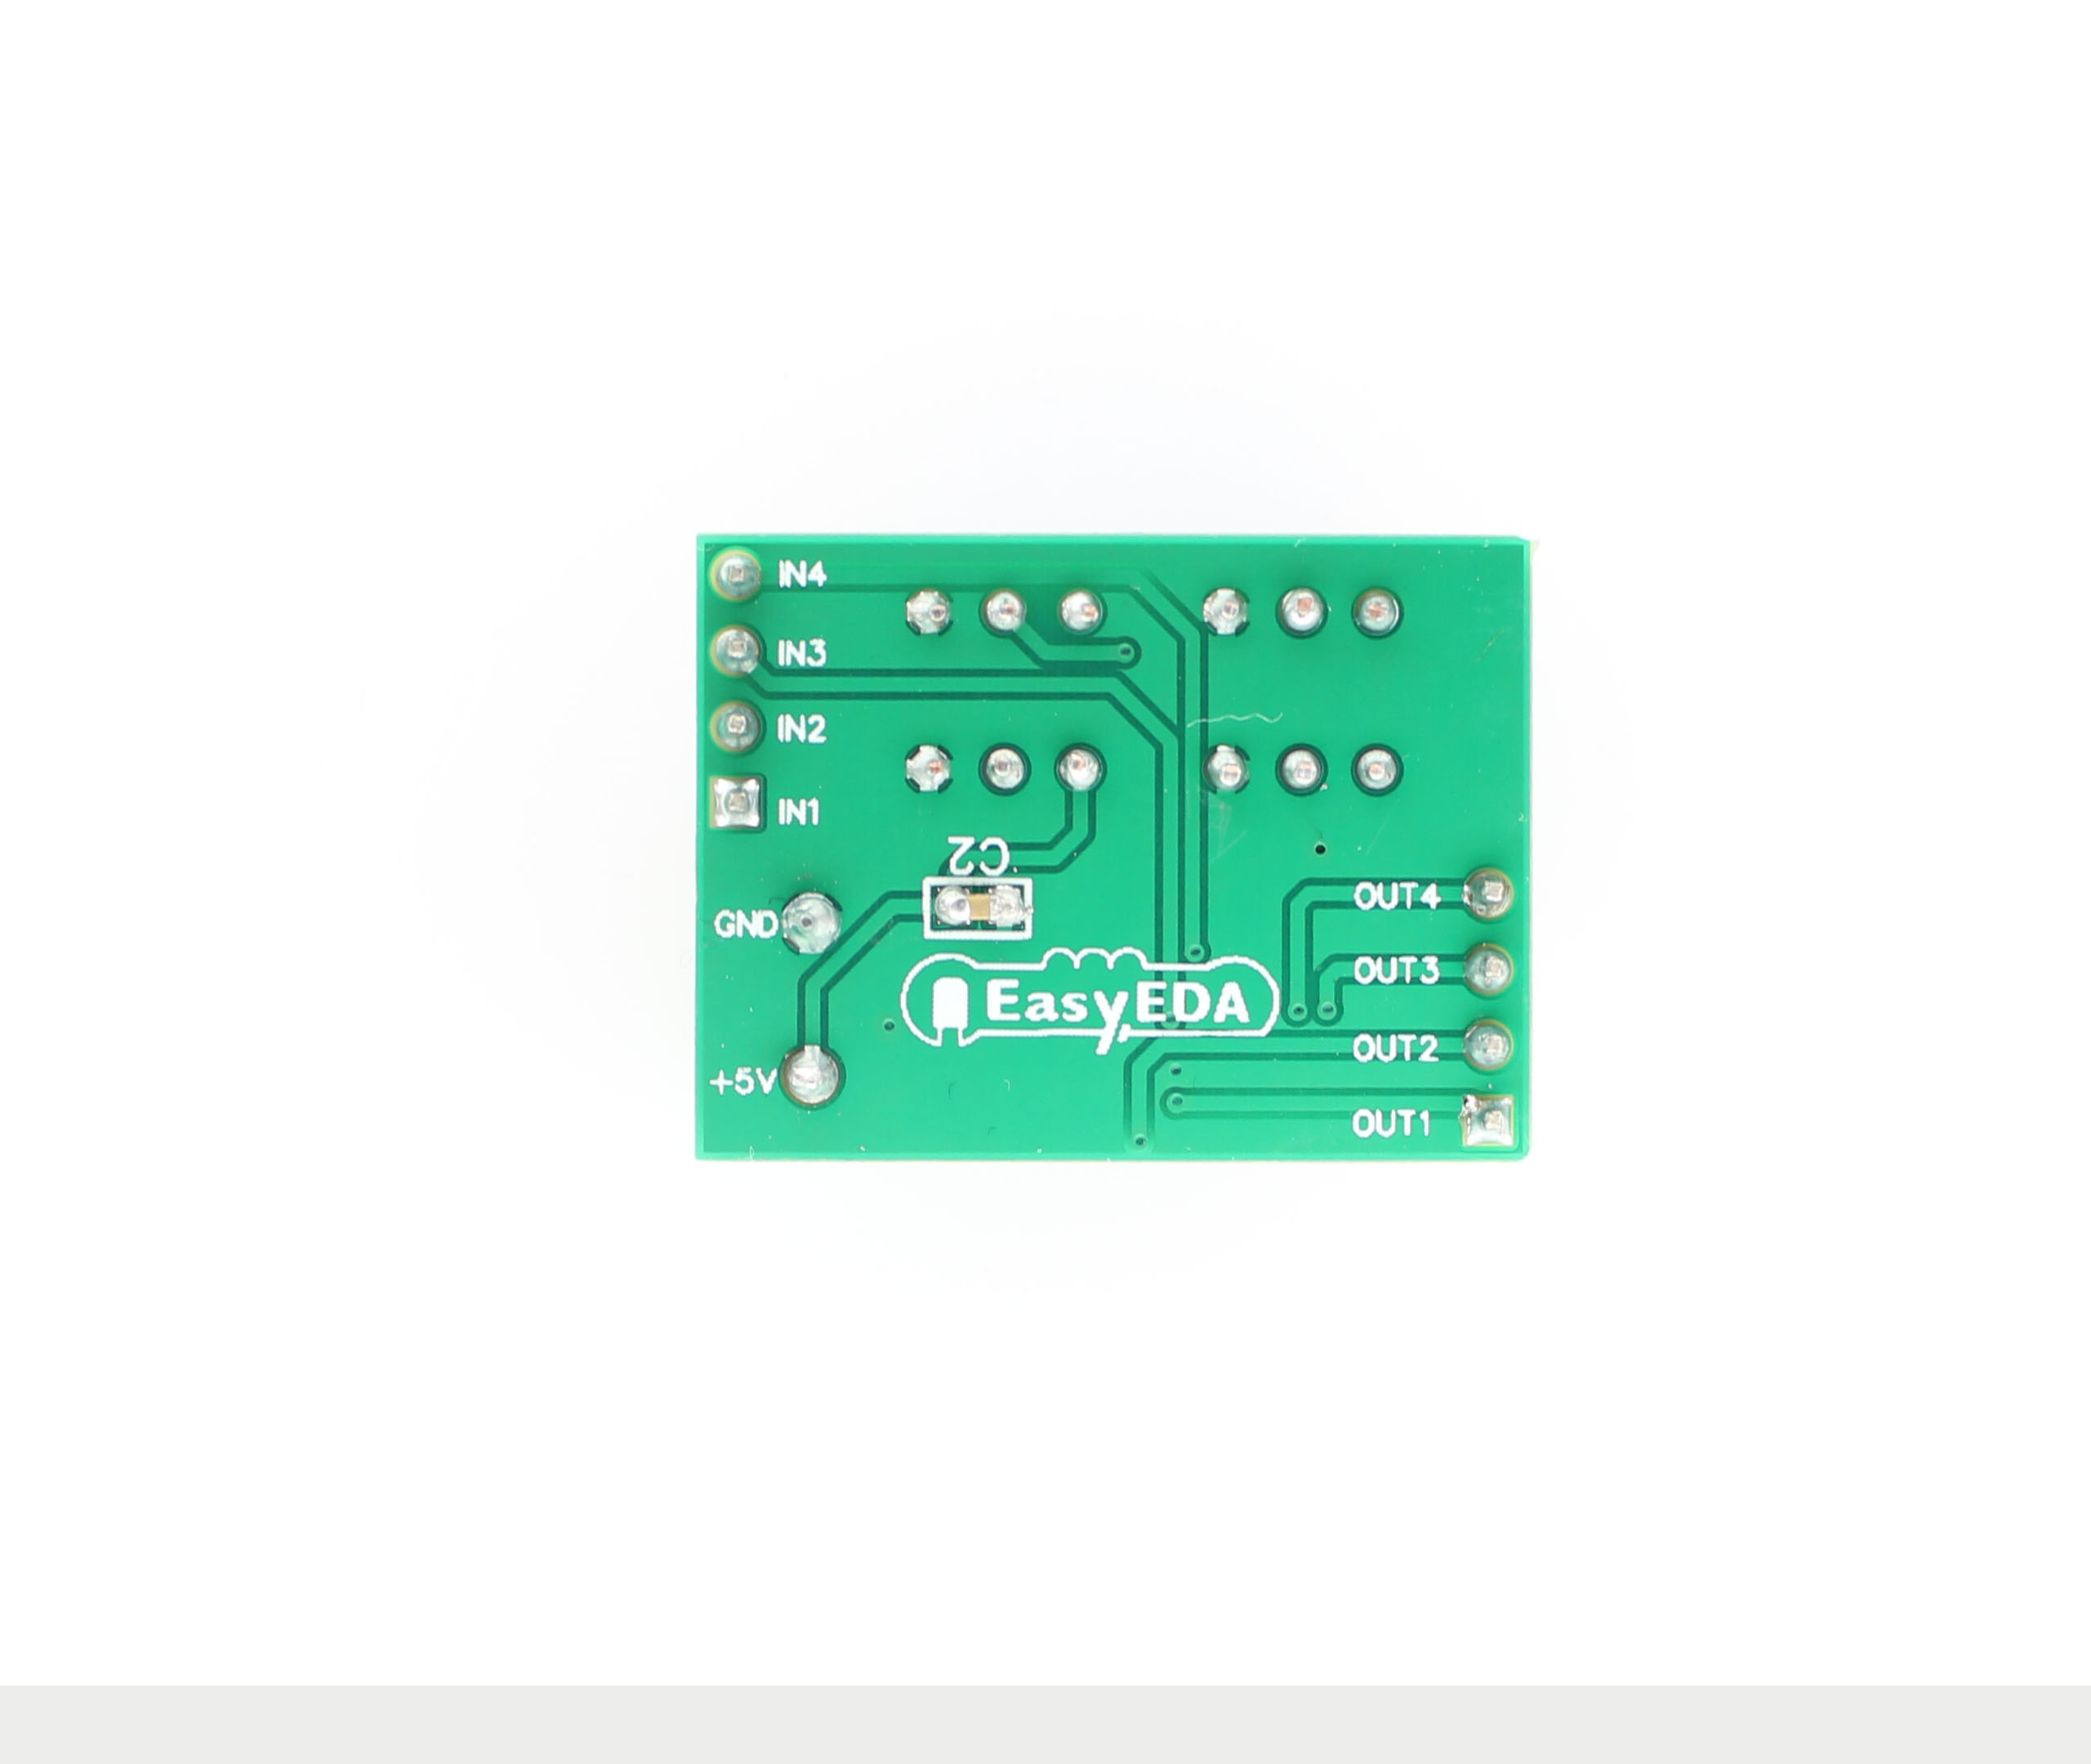 Lm339 For Voltage Comparator Easyeda Circuit Diagram Real Figure 4 Enter Image Description Here